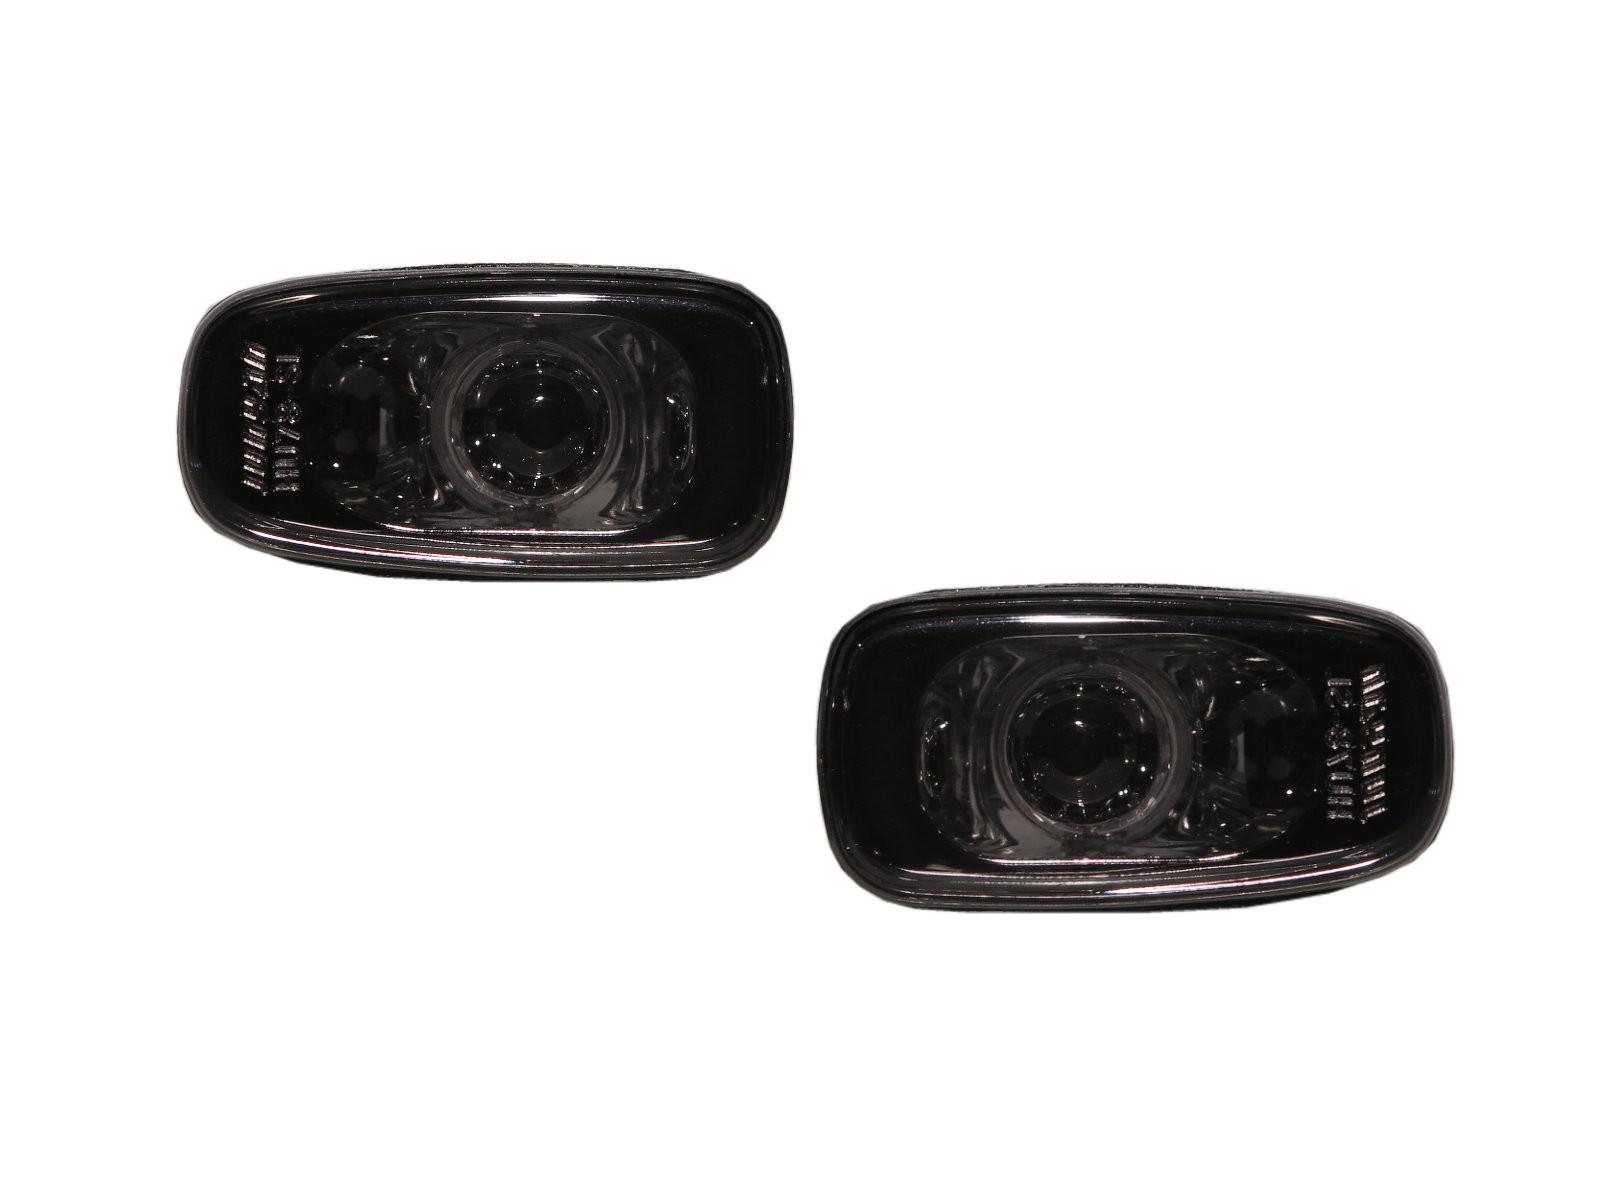 CrazyTheGod IS IS200/IS300 XE10 First generation 1999-2005 Sedan 4D Clear Side Marker Light Lamp Smoke for LEXUS